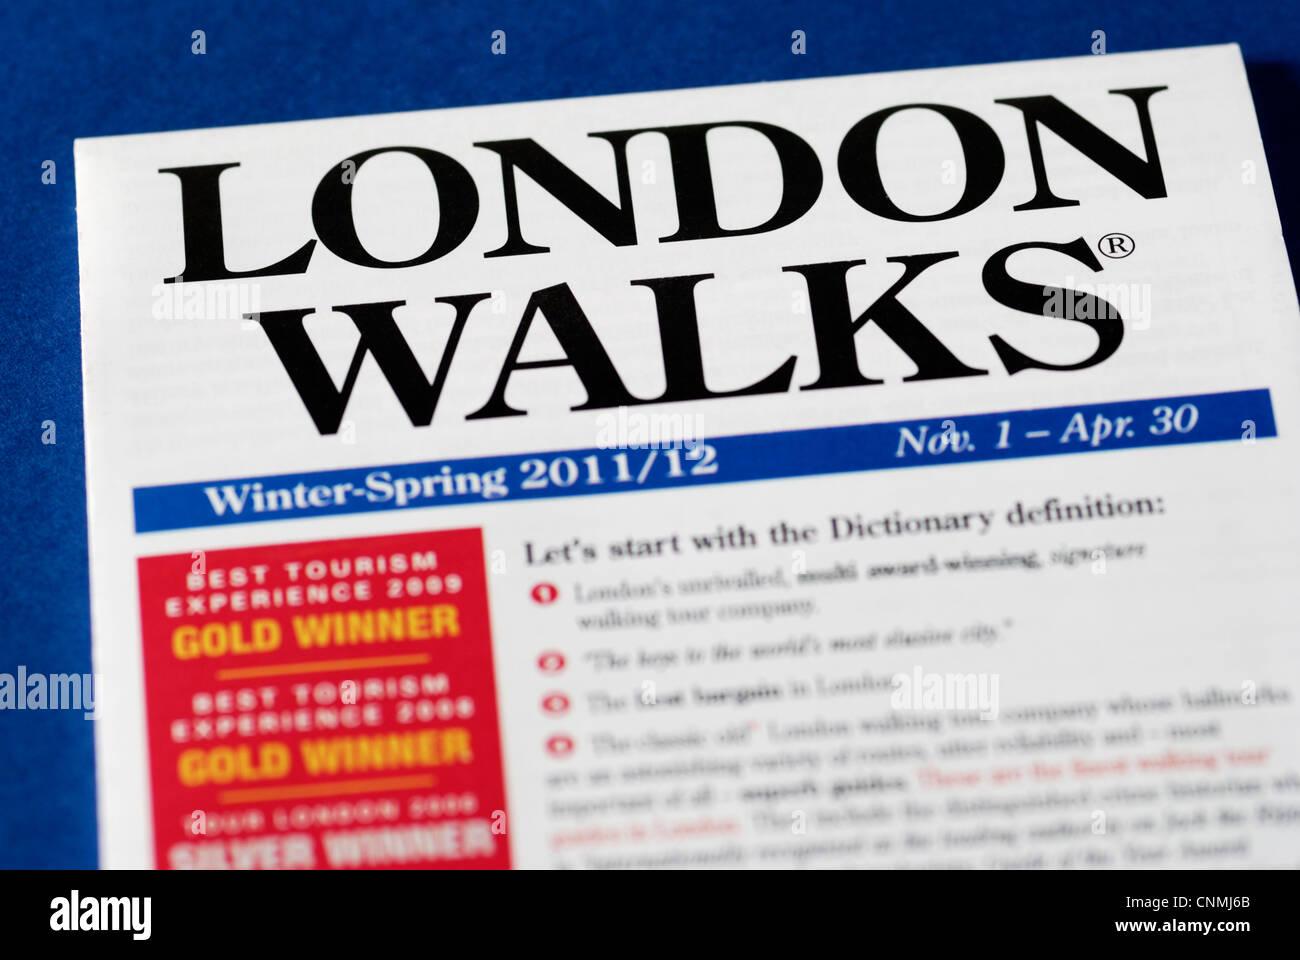 london walks urban walking tour company pamphlet stock photo